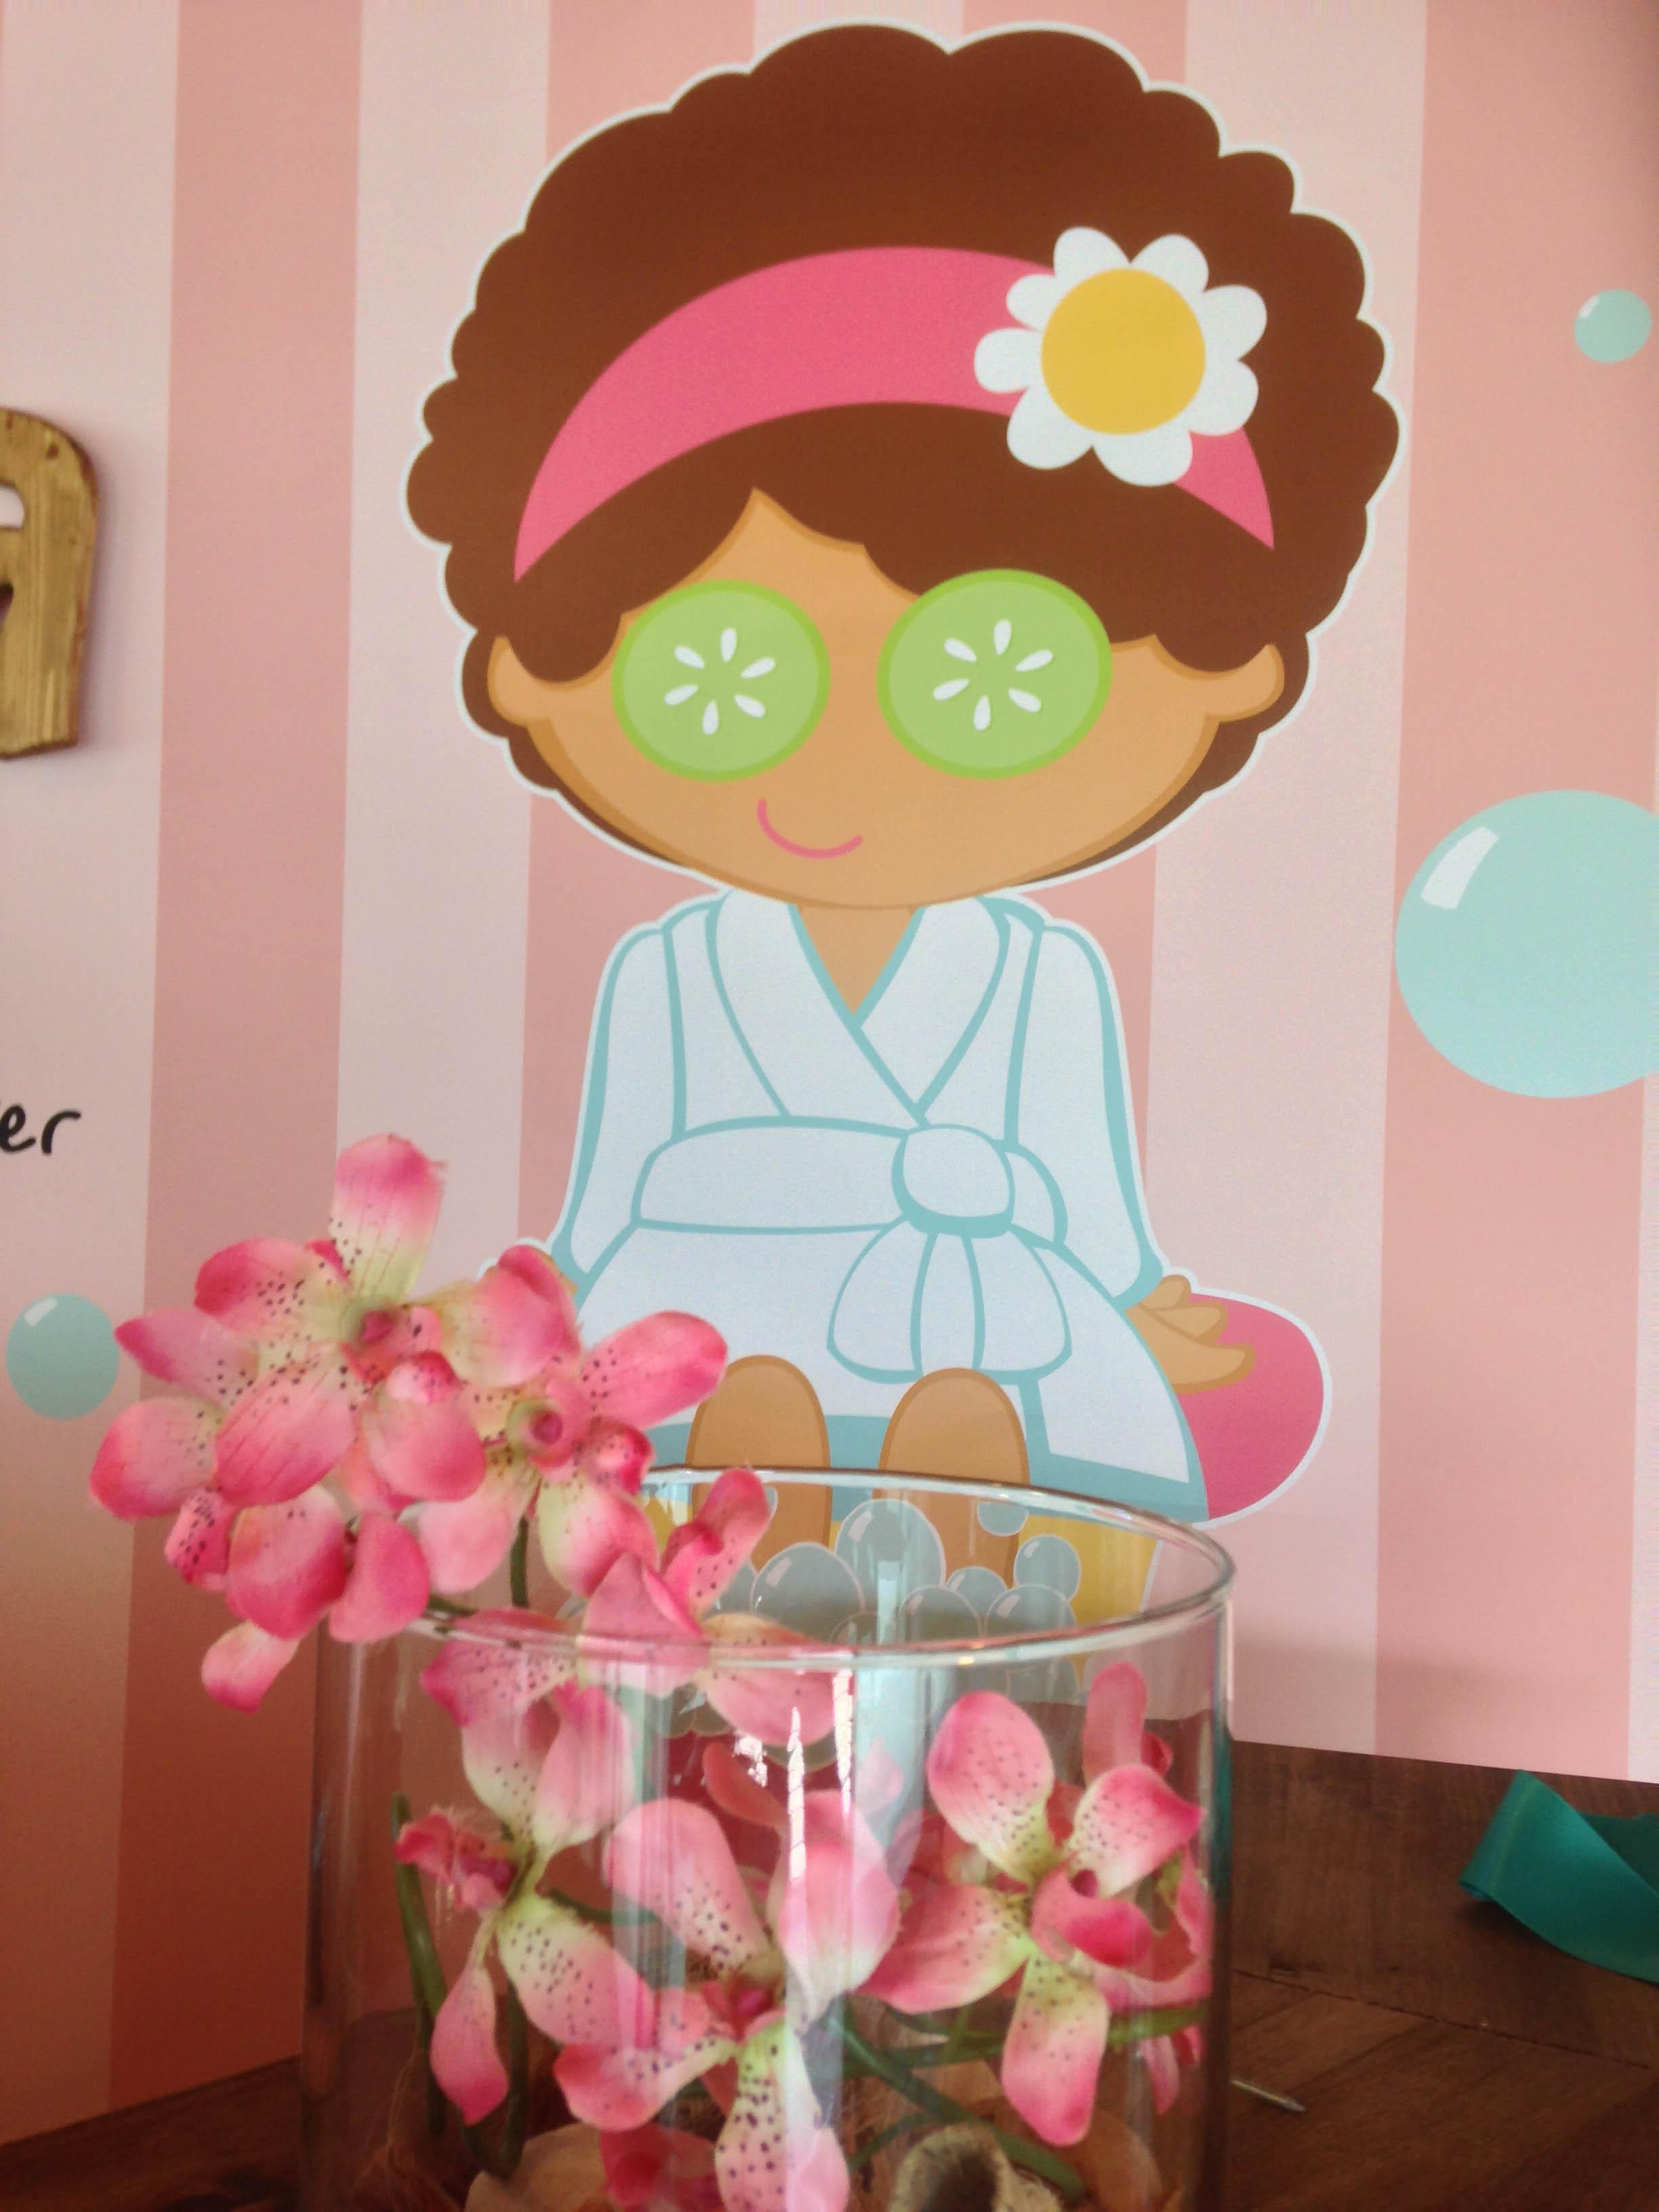 Chiquititas spa ni as - Motivos infantiles para decorar ...